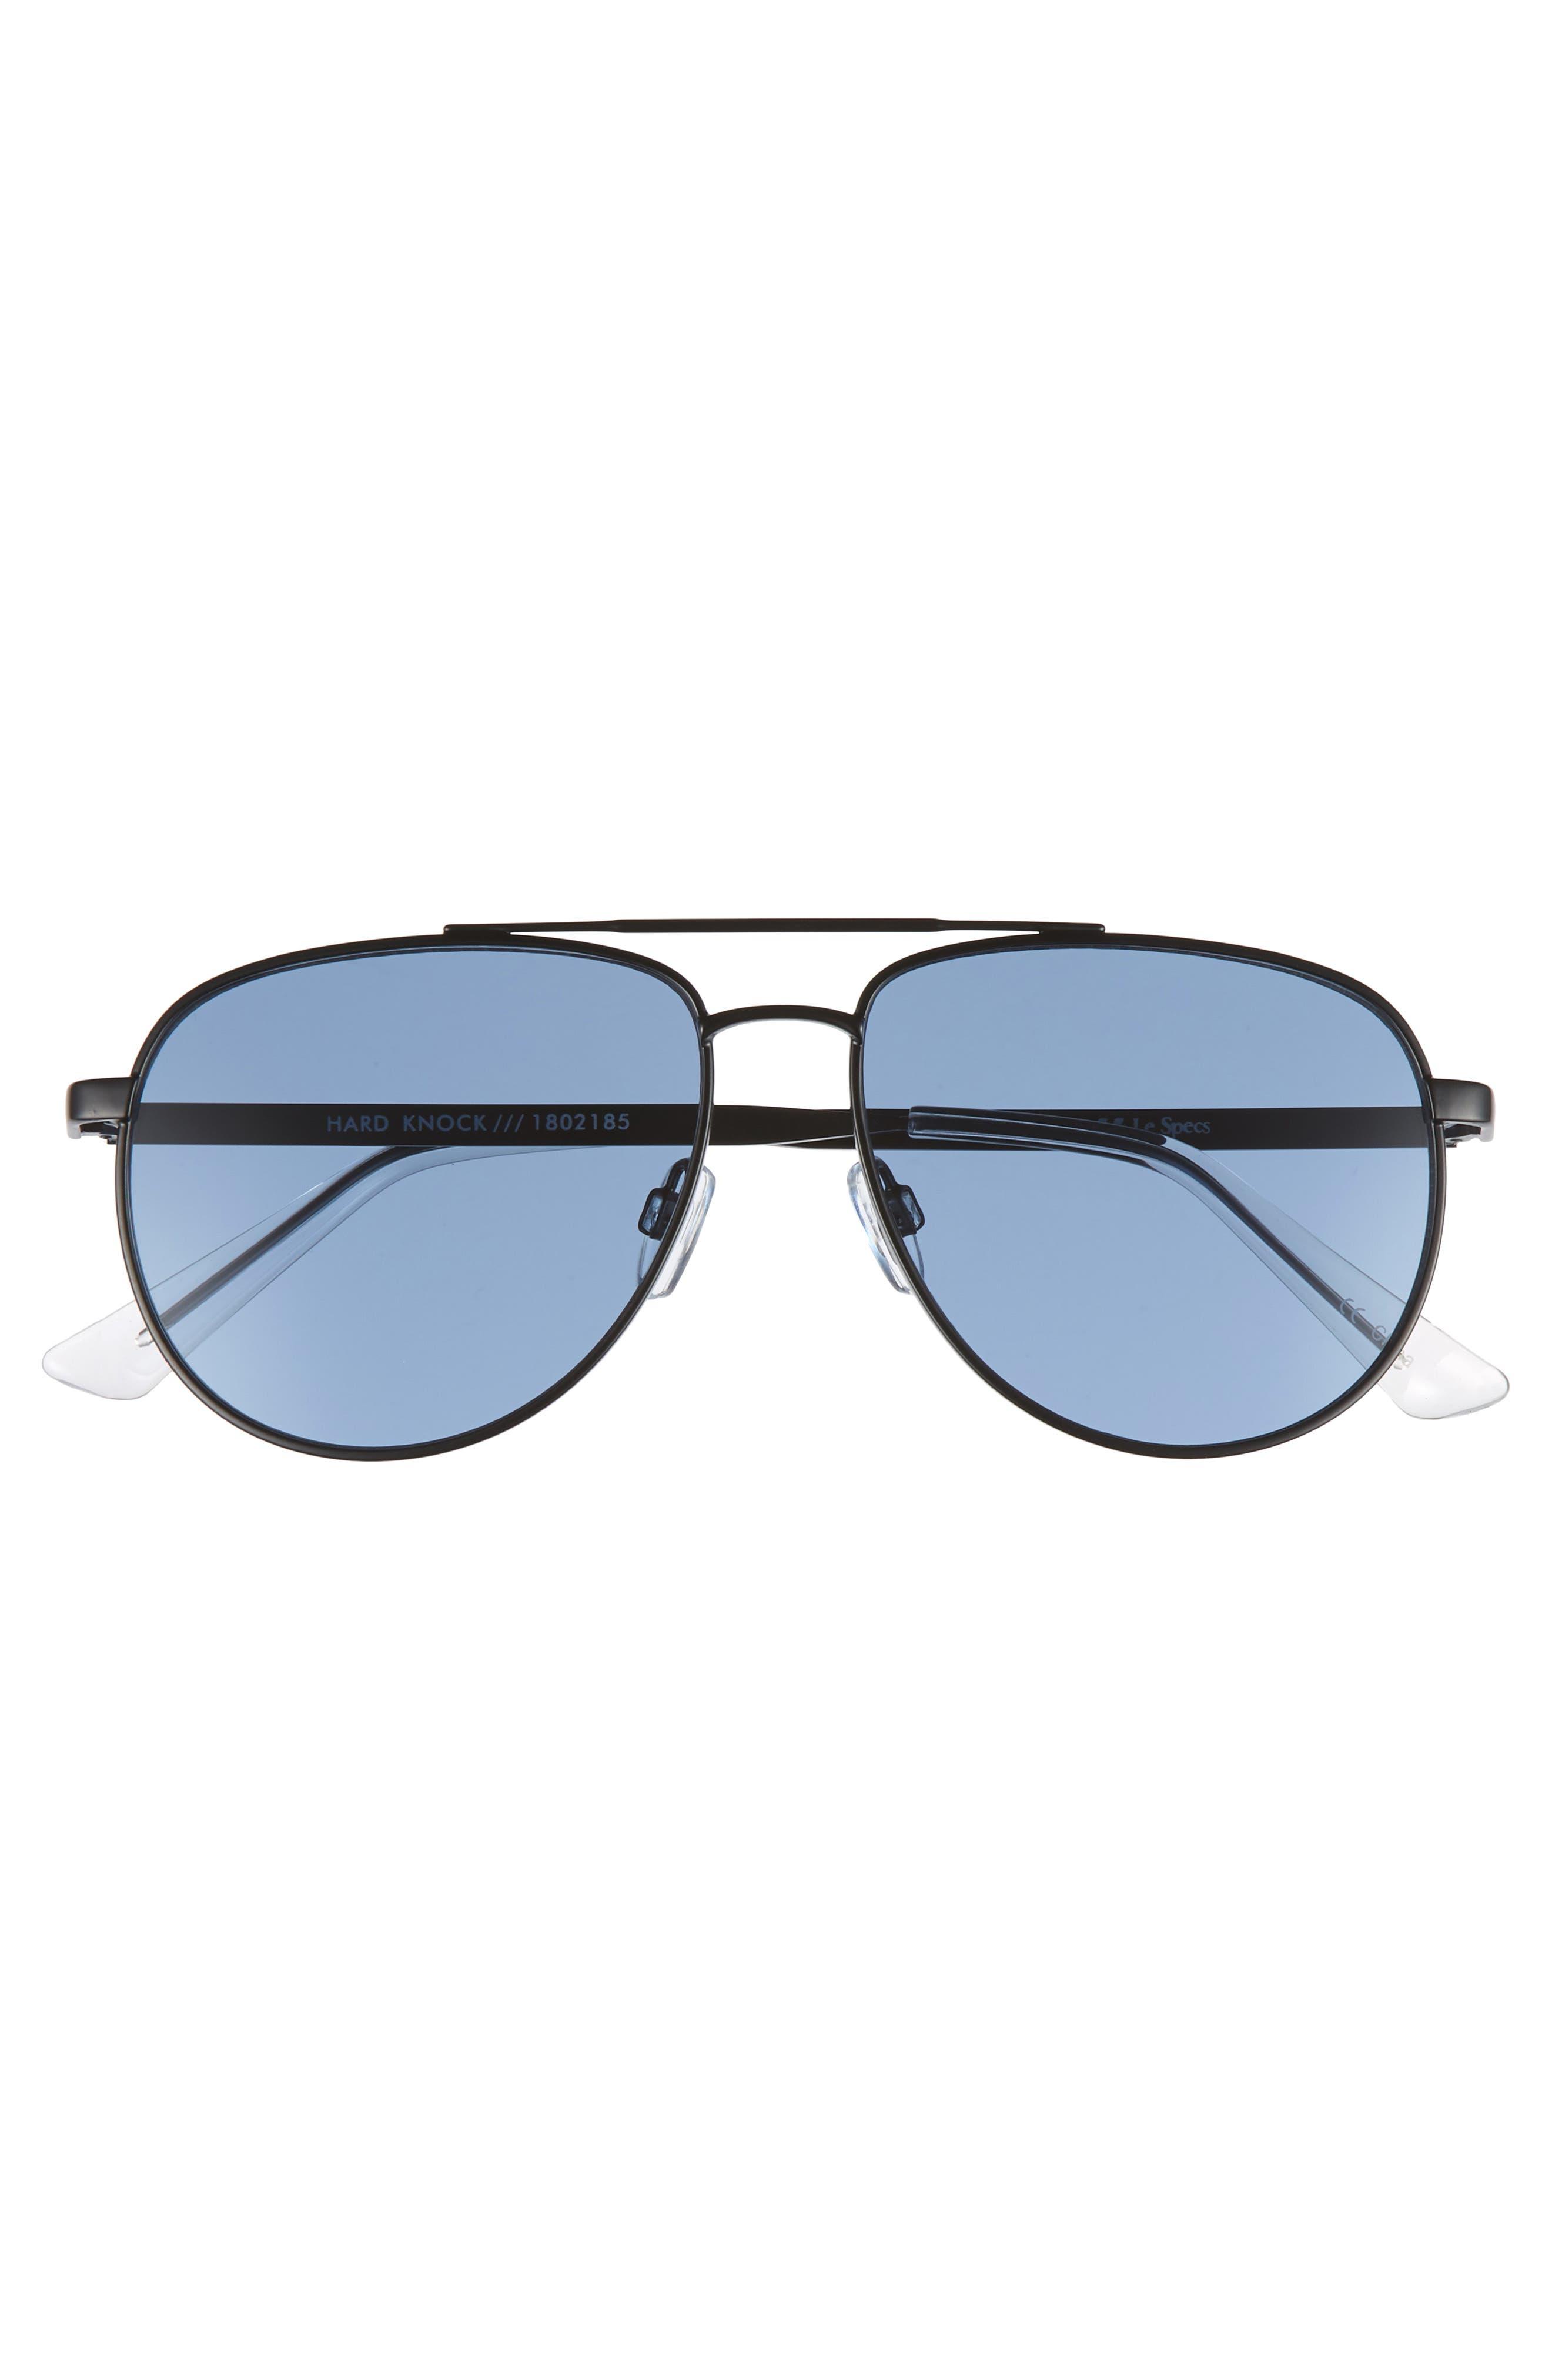 Hard Knock 57mm Aviator Sunglasses,                             Alternate thumbnail 3, color,                             Matte Navy